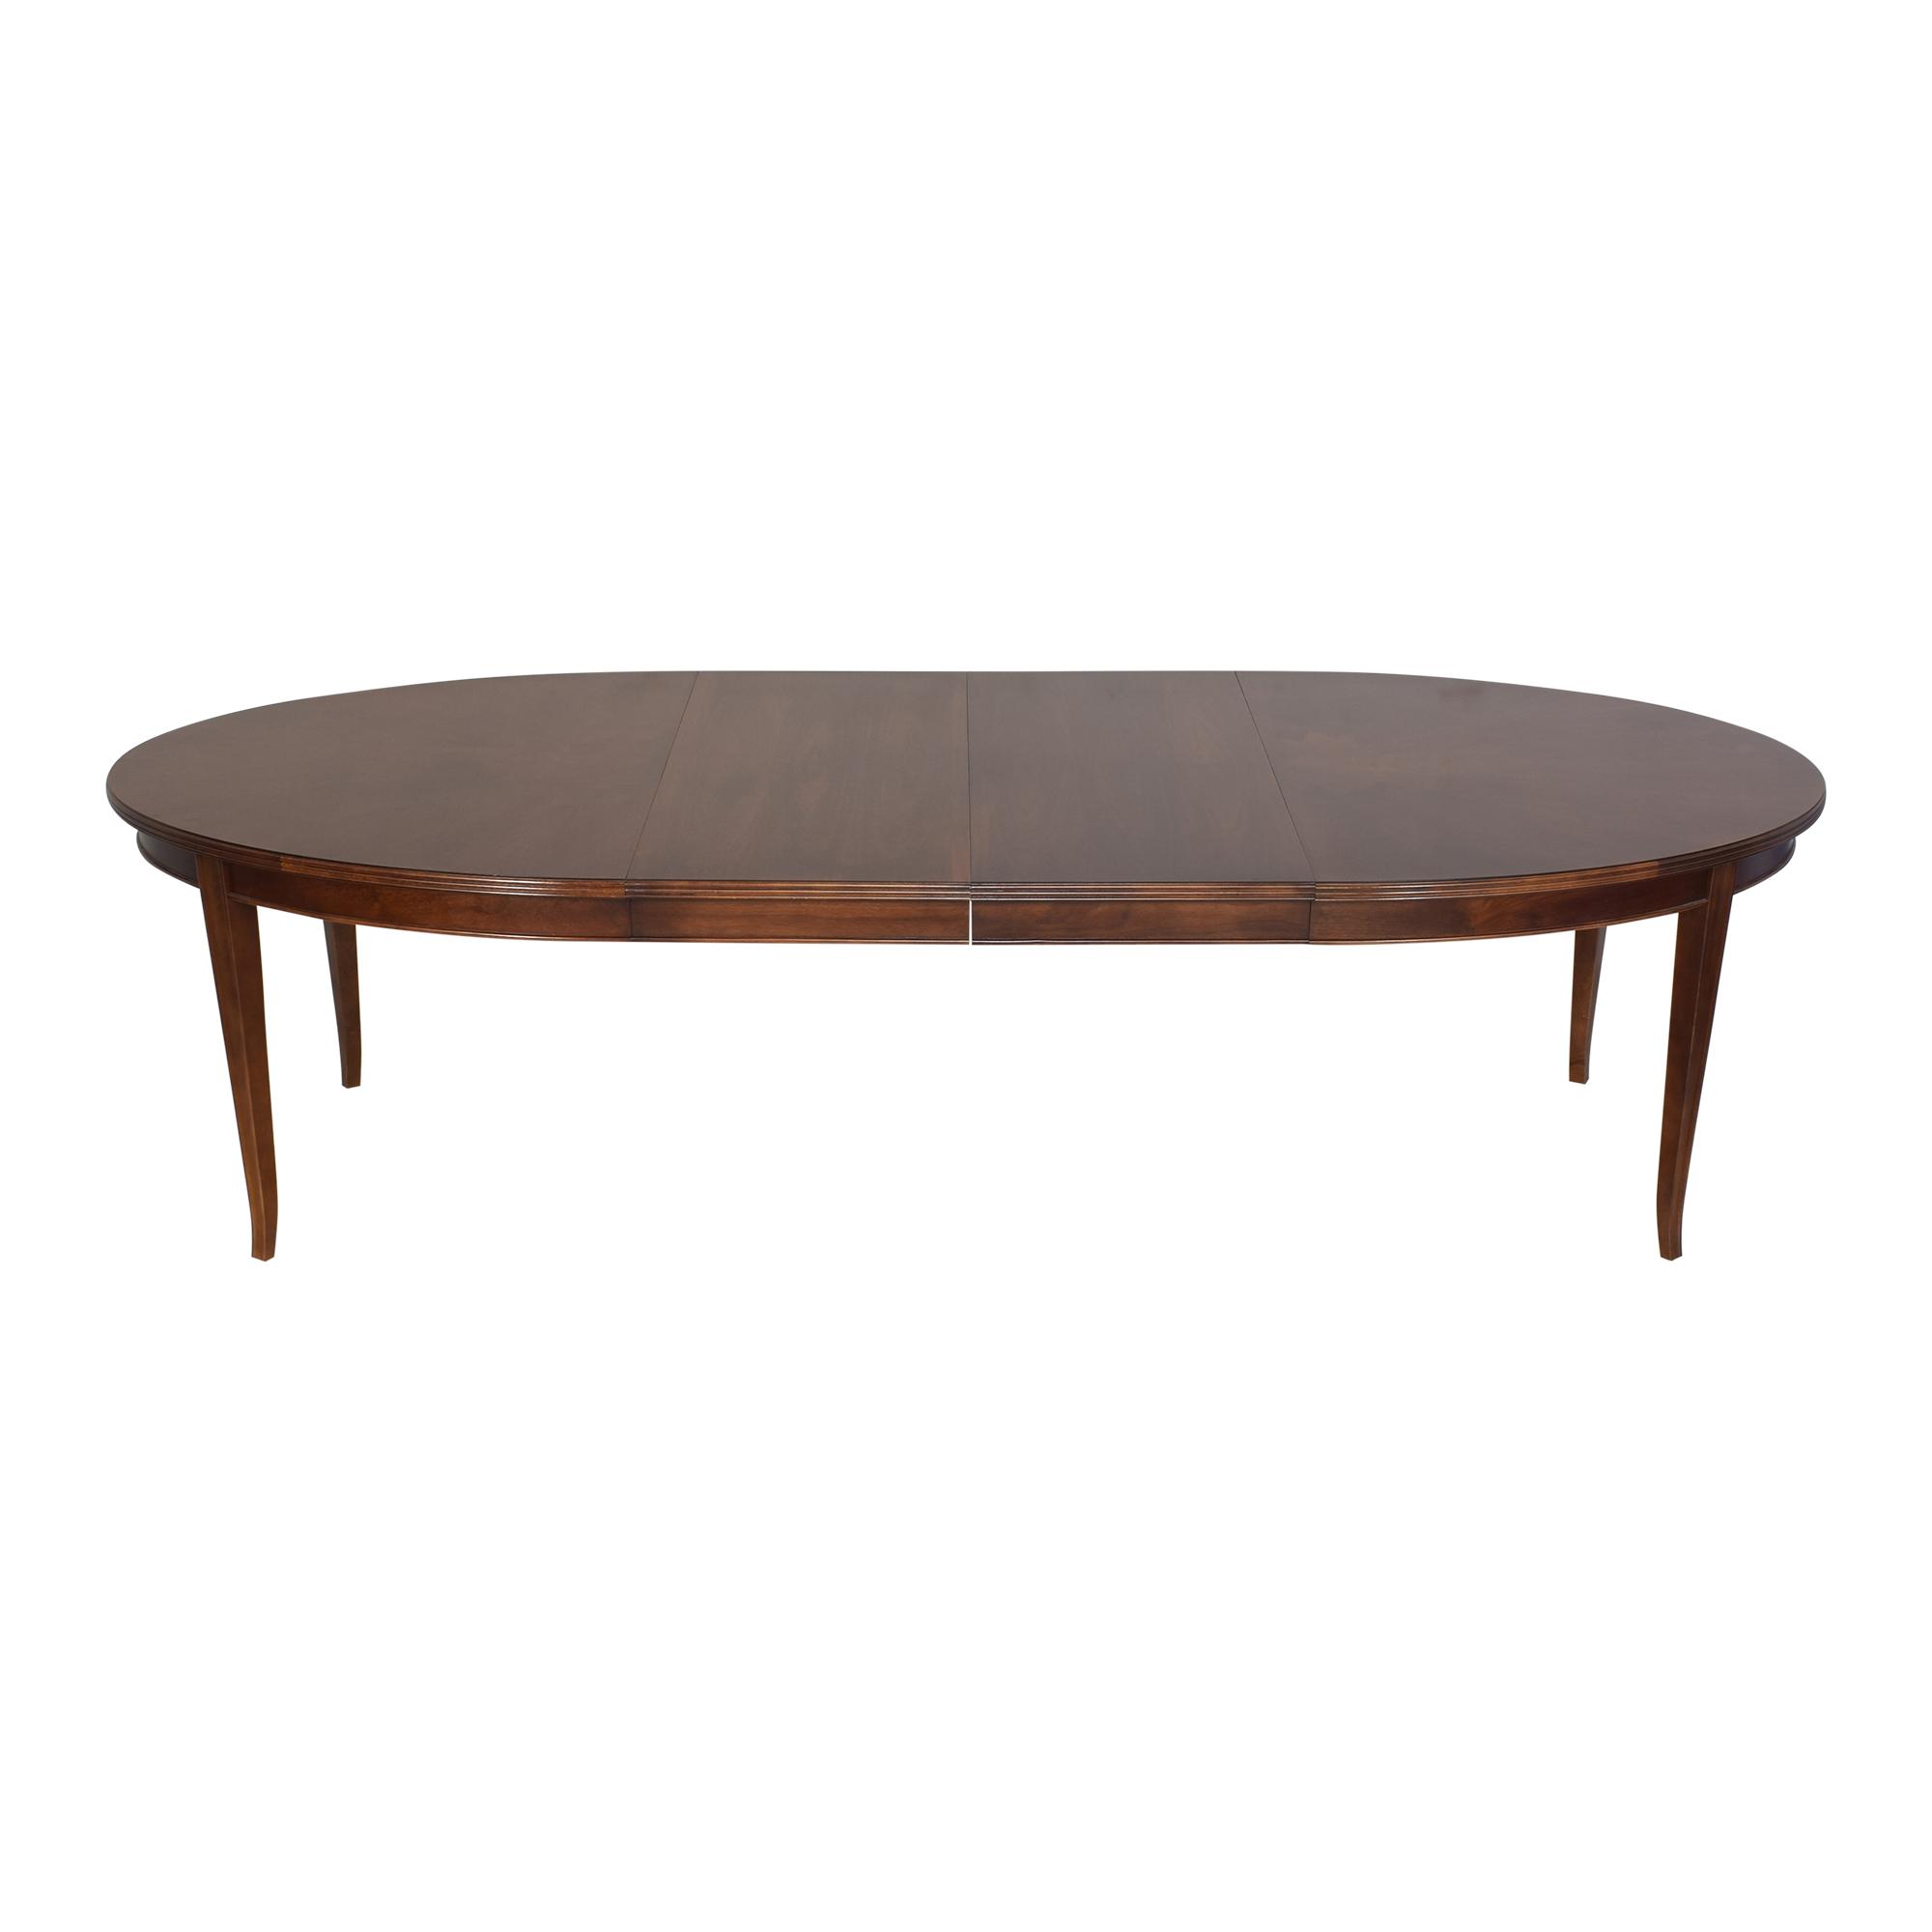 Stanley Furniture Stanley Furniture Hudson Street Riverside Dining Table dimensions